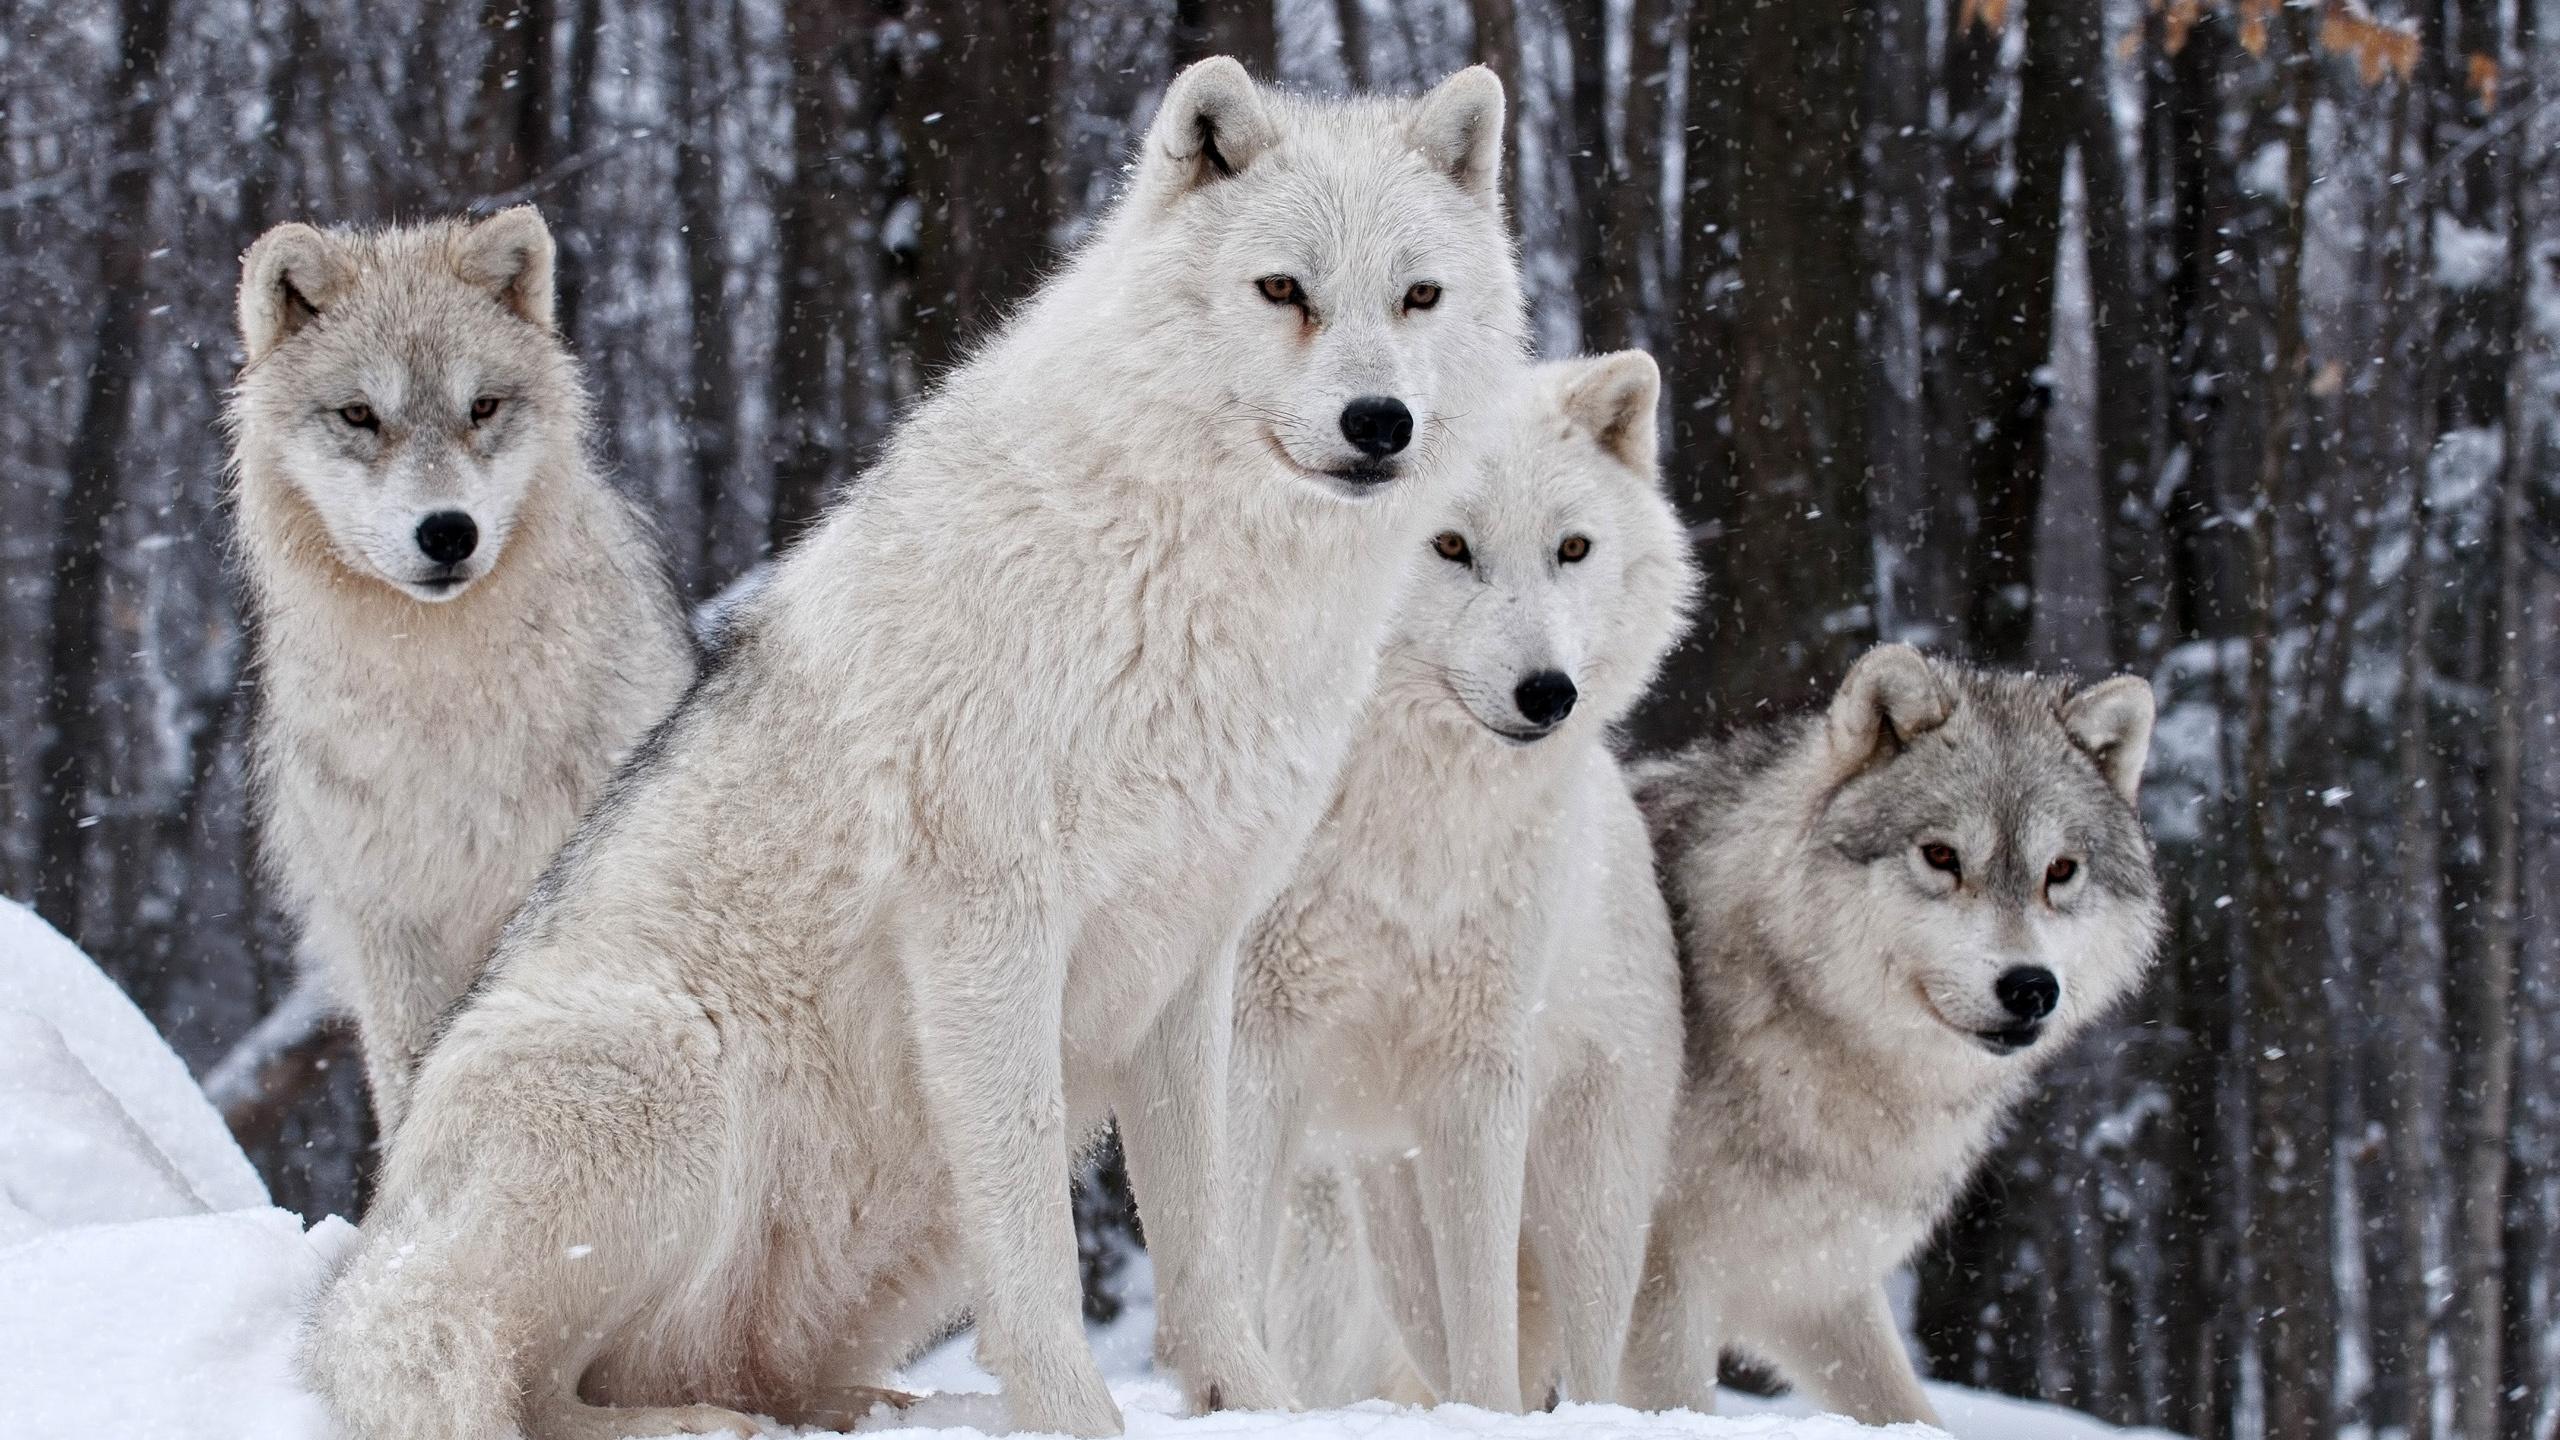 Loups famille nature hiver fonds d 39 cran 2560x1440 qhd for Fond ecran qhd